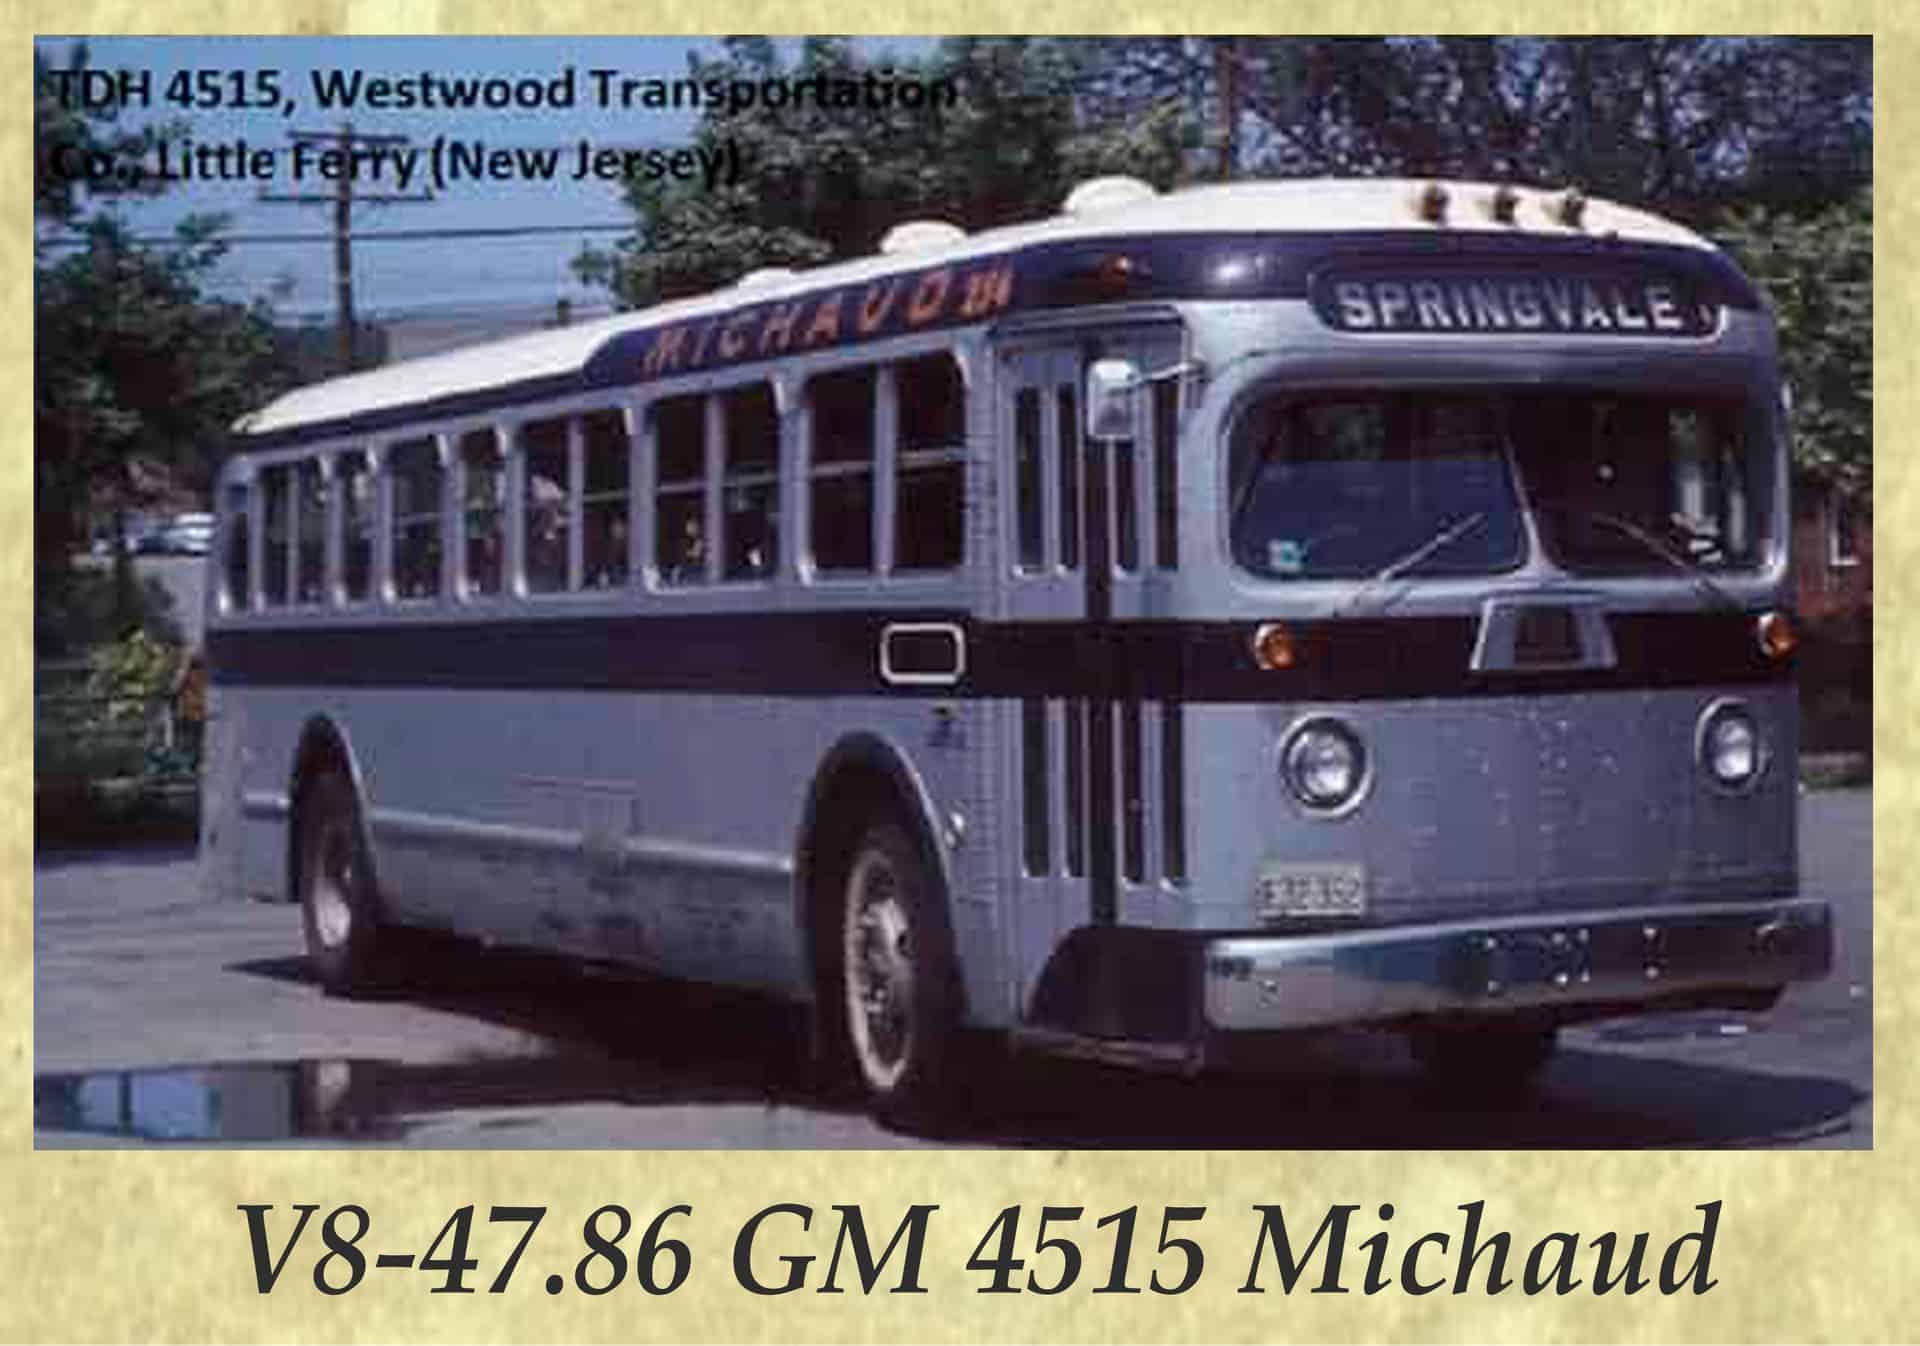 V8-47.86 GM 4515 Michaud